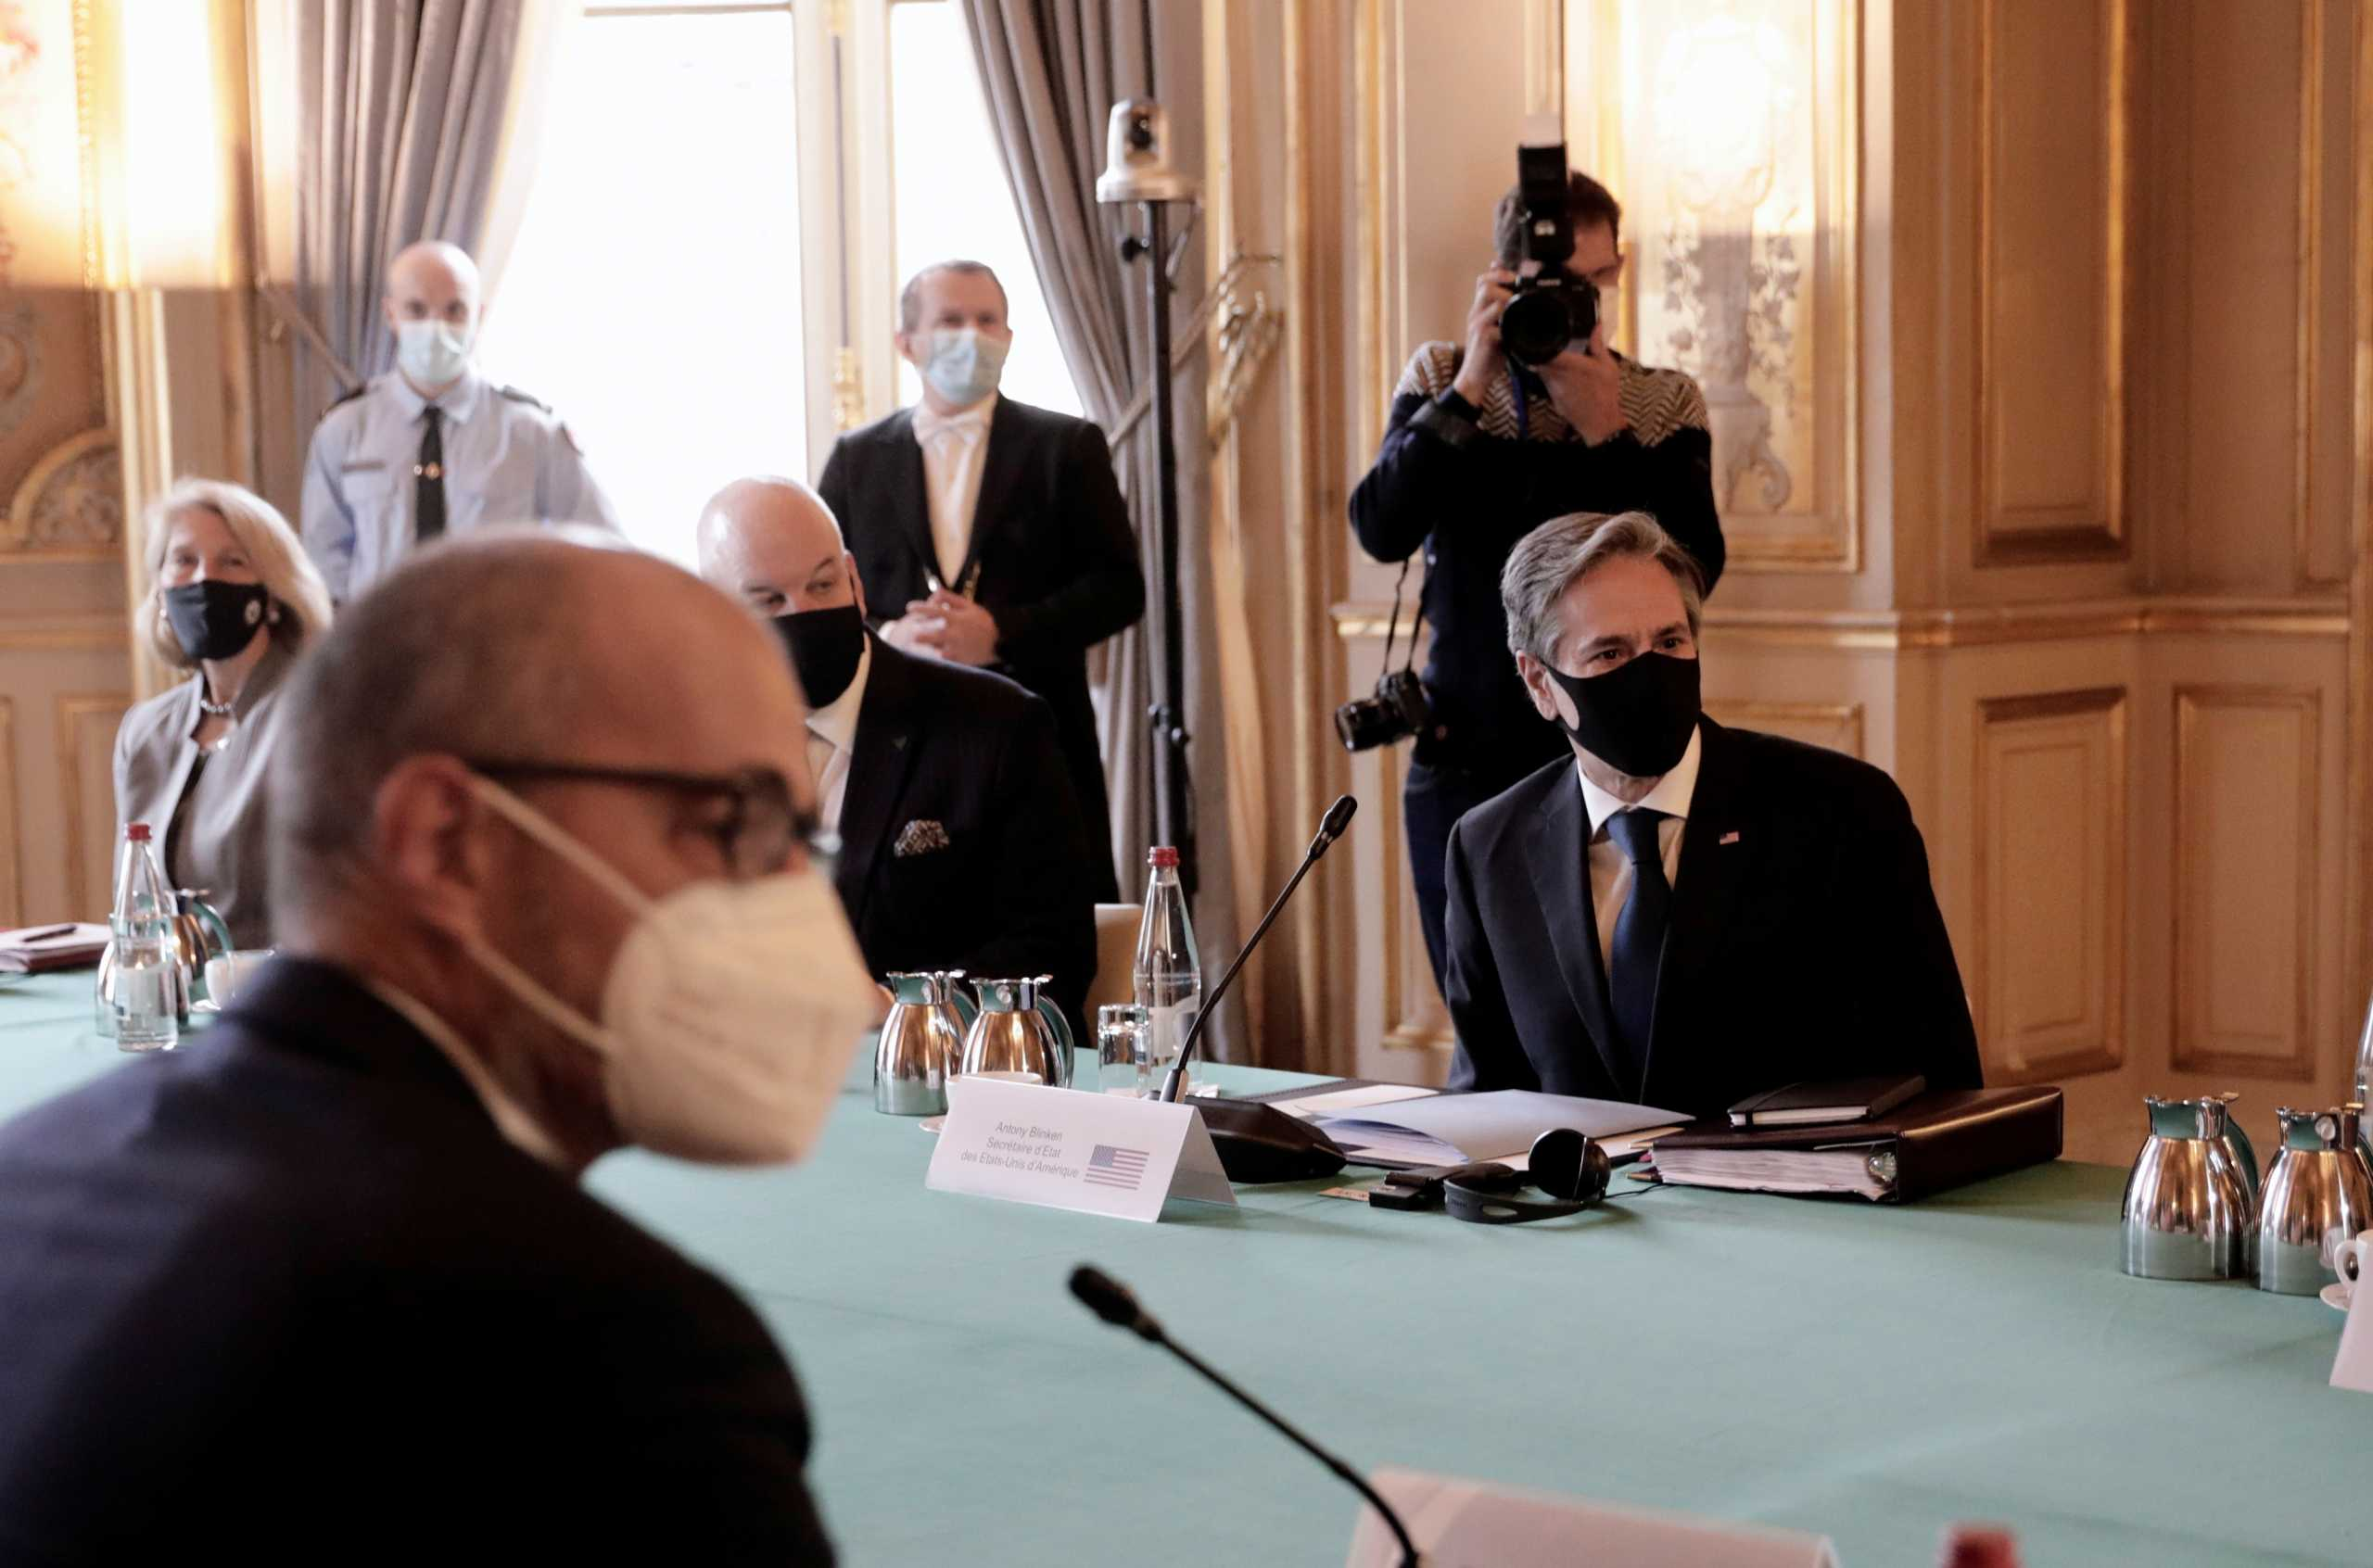 AUKUS: Στην Γαλλία ο Άντονι Μπλίνκεν μέσα σε ατμόσφαιρα…. ηλεκτρισμένη